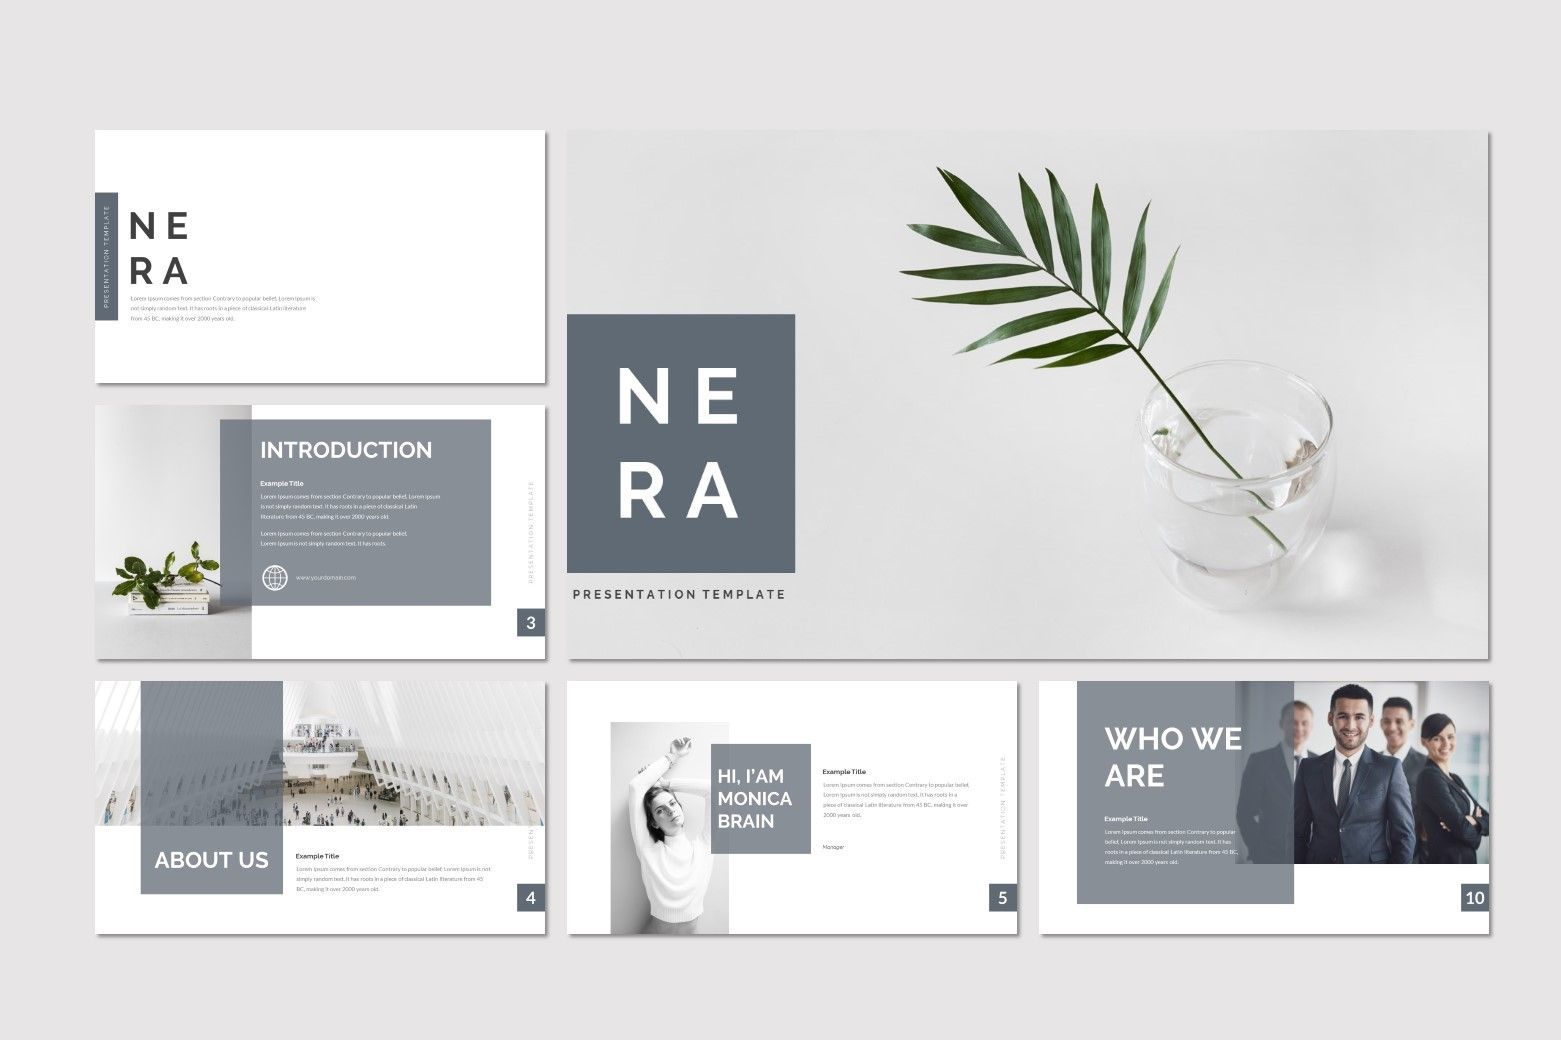 Nera - PowerPoint Template, Slide 2, 08557, Presentation Templates — PoweredTemplate.com